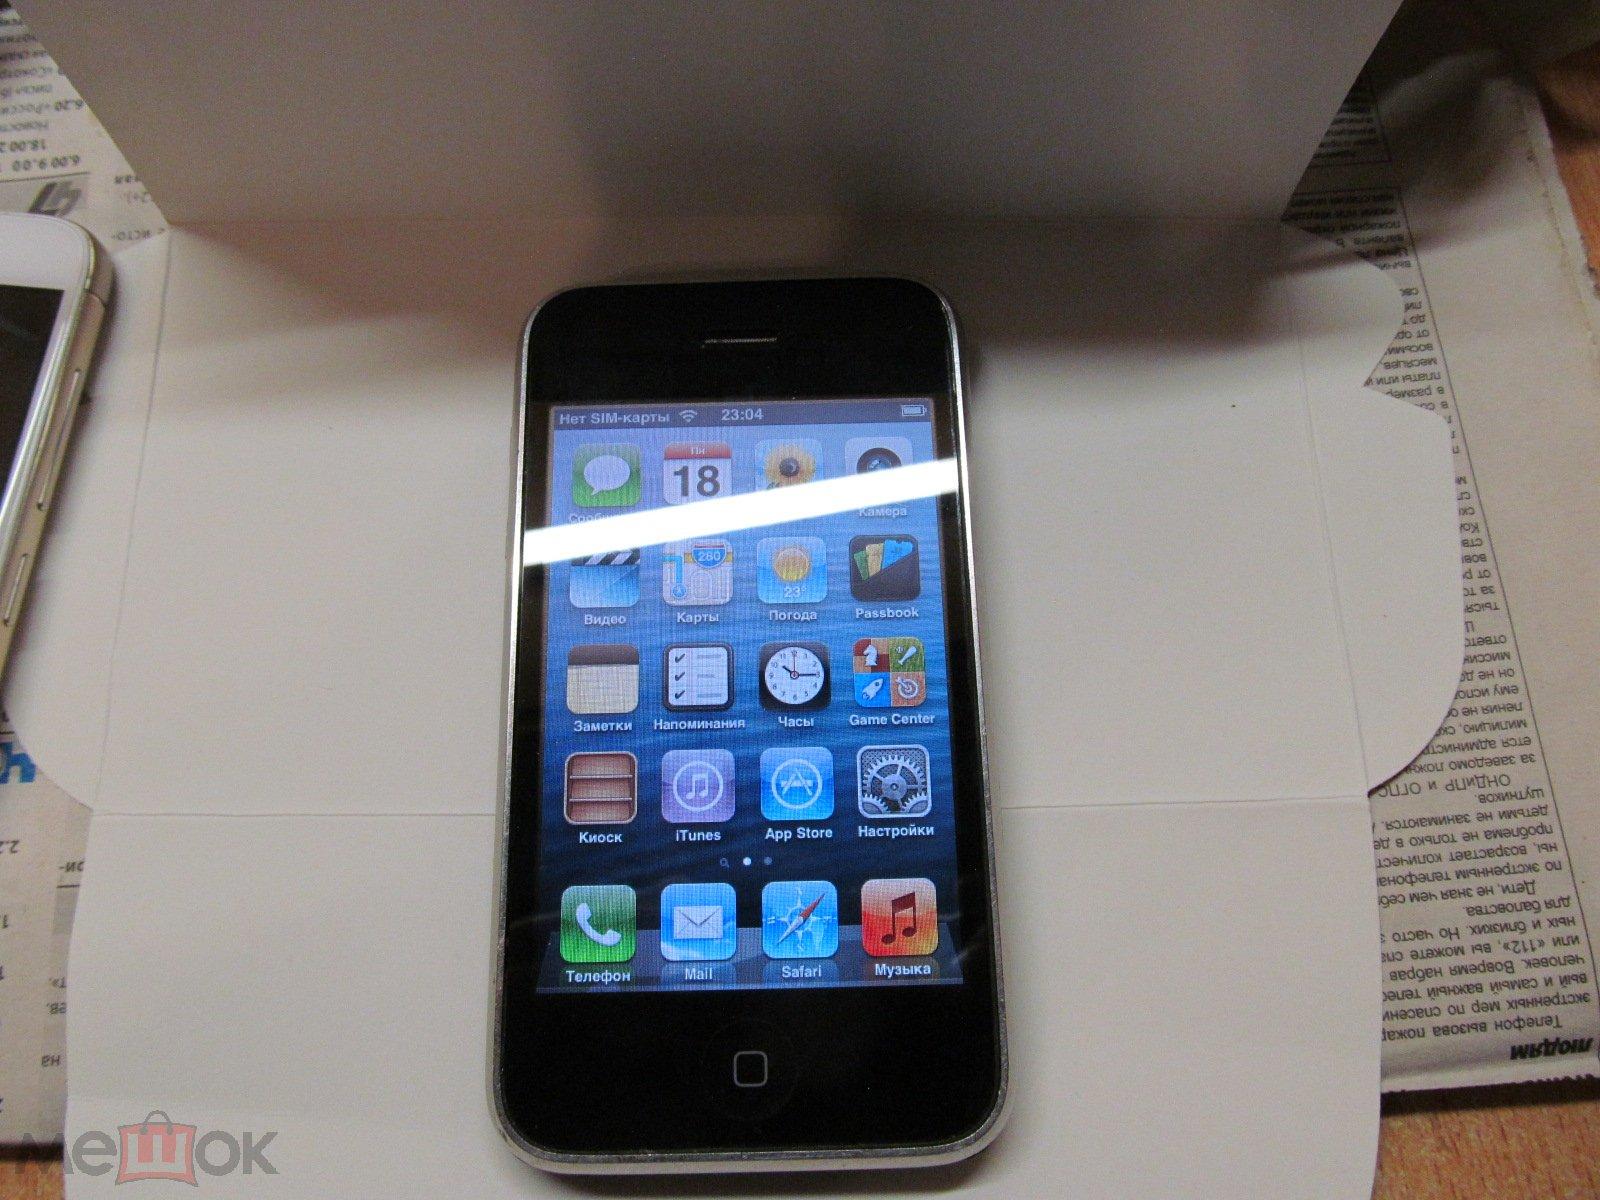 все об iphone 3gs